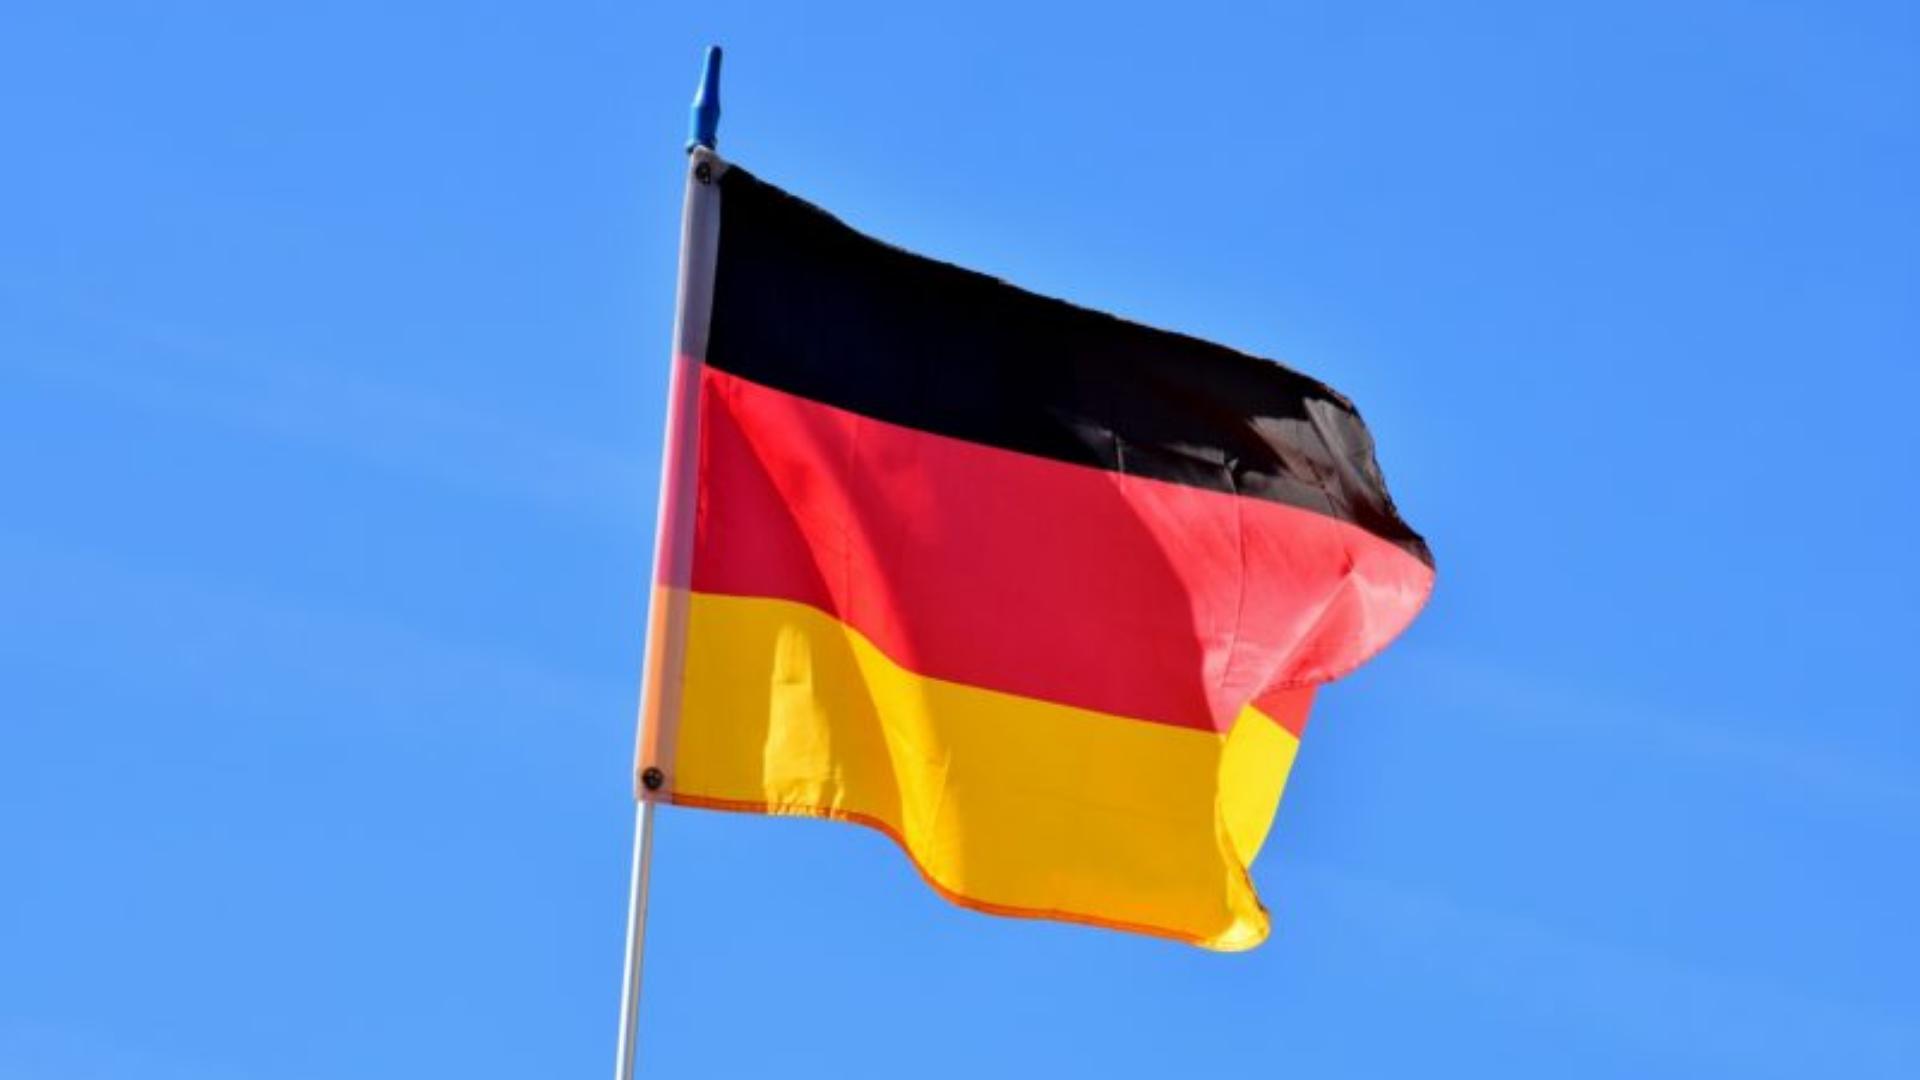 De lastige Duitse taal